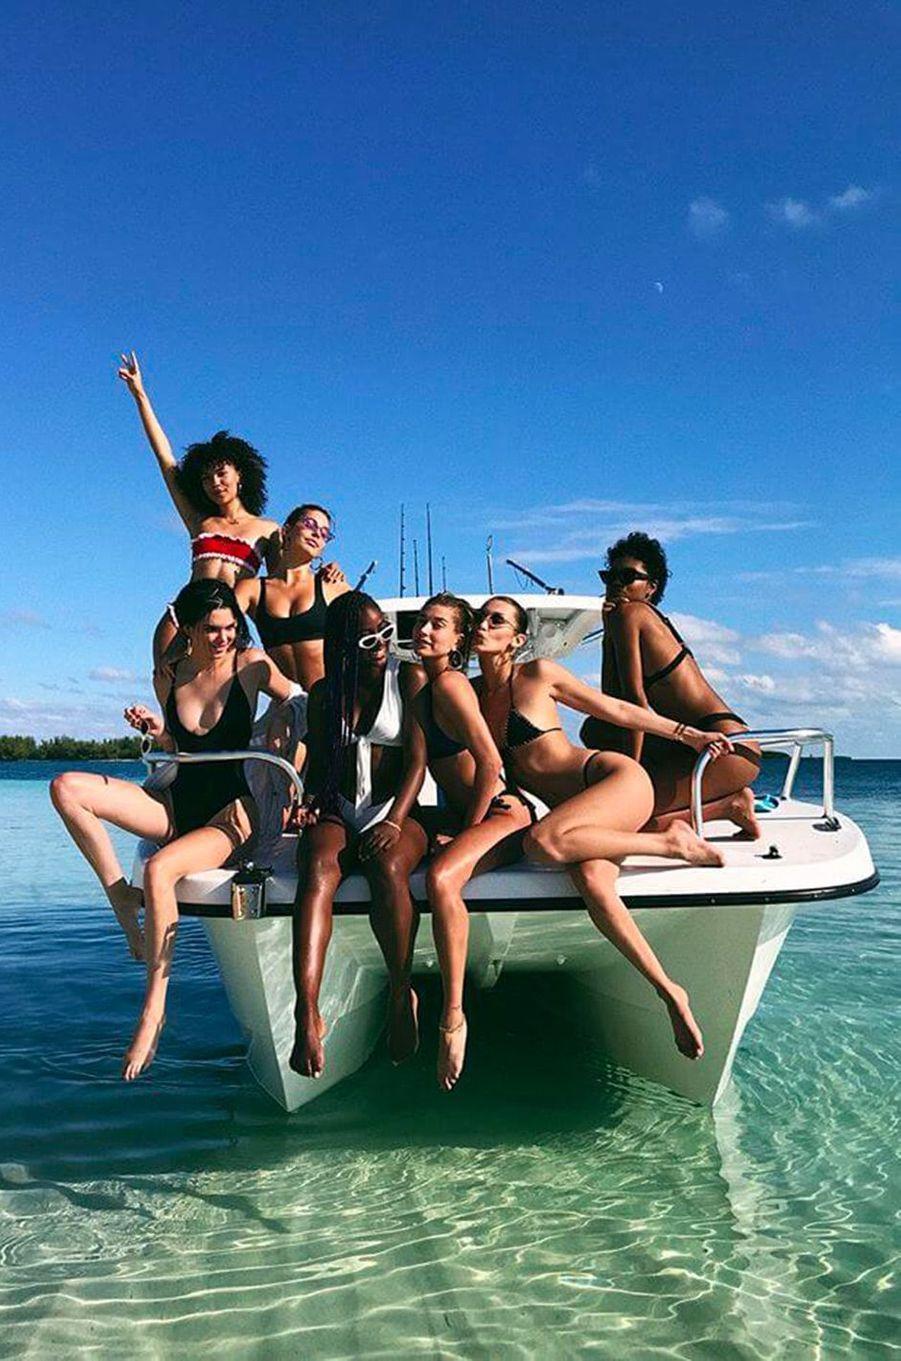 Kendall Jenner, Hailey Baldwin, Bella Hadid et leurs amies en vacances aux Bahamas